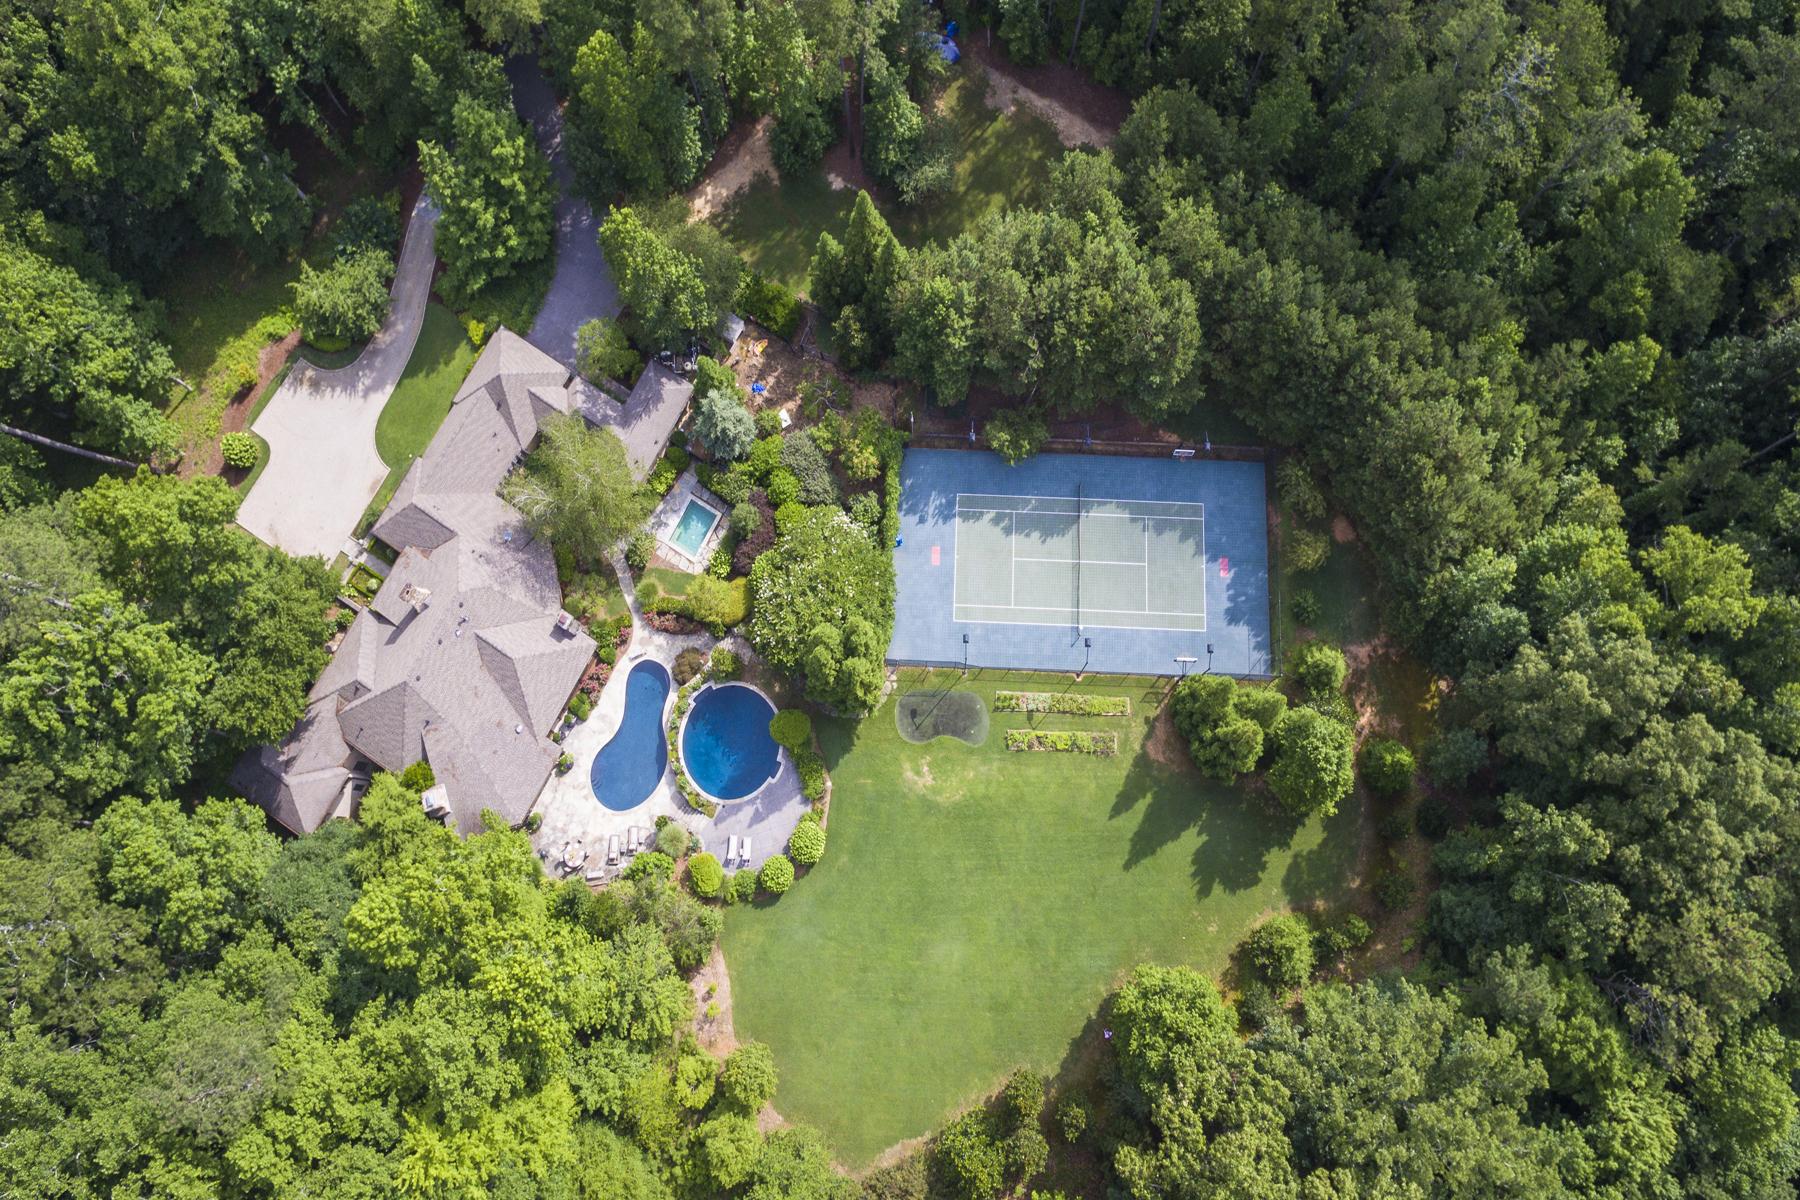 独户住宅 为 销售 在 One Of A Kind French Country European Estate 159 Lambets Way Johns Creek, 乔治亚州, 30005 美国